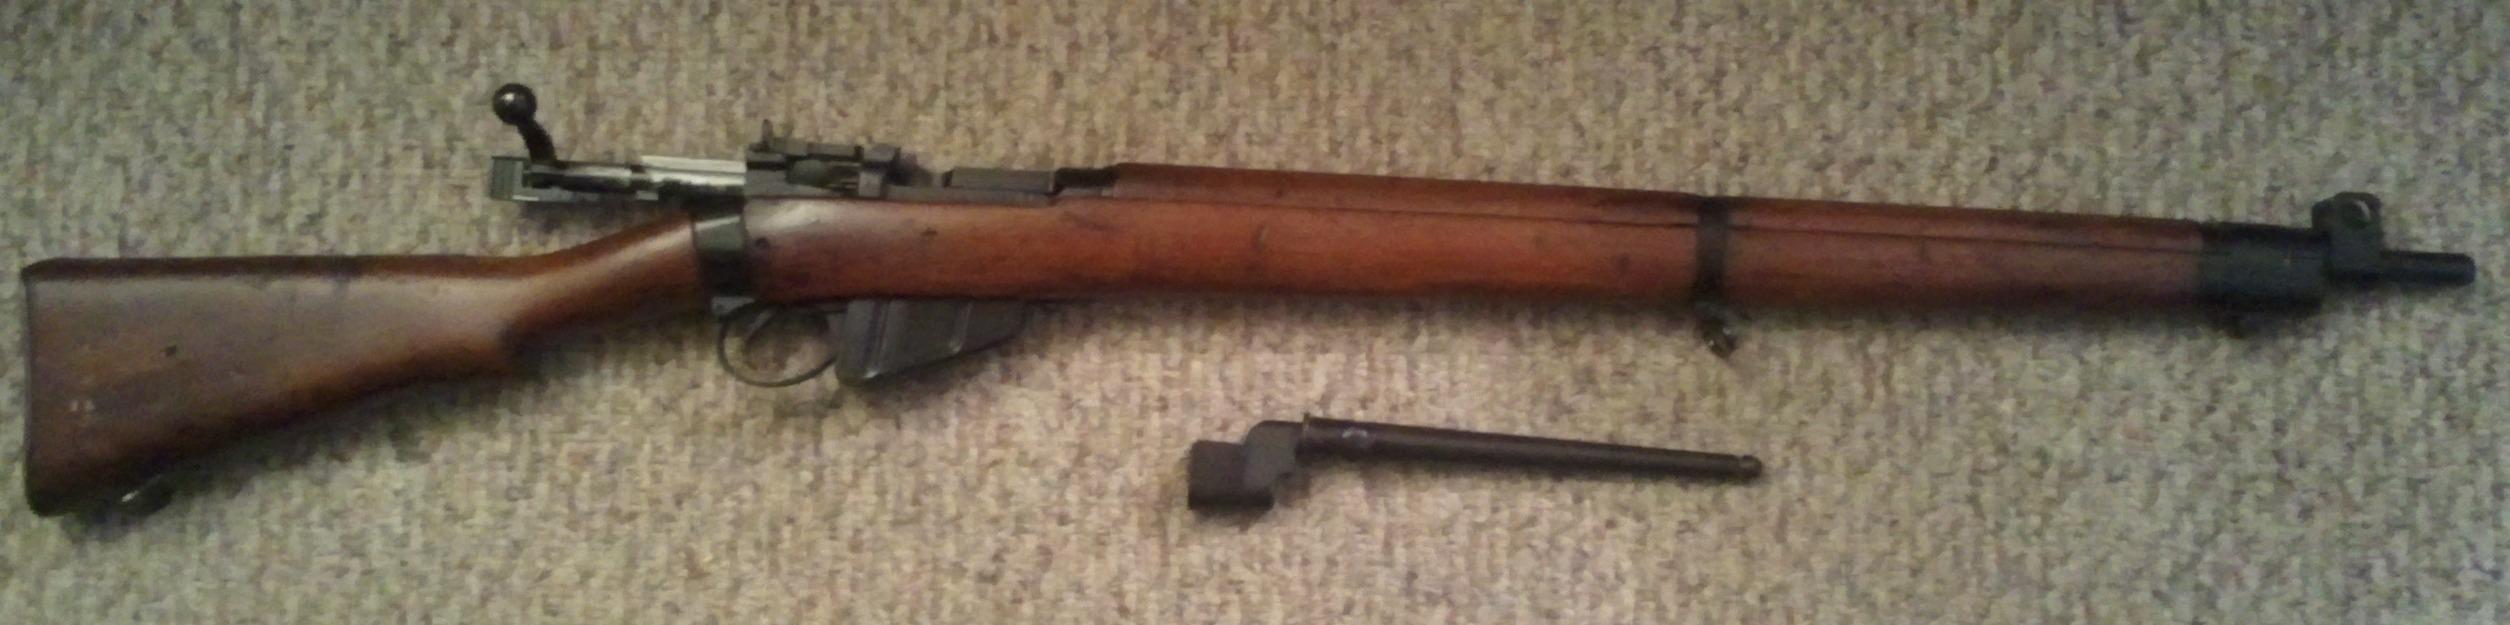 Surplus rifles Part 2 303 British Enfield